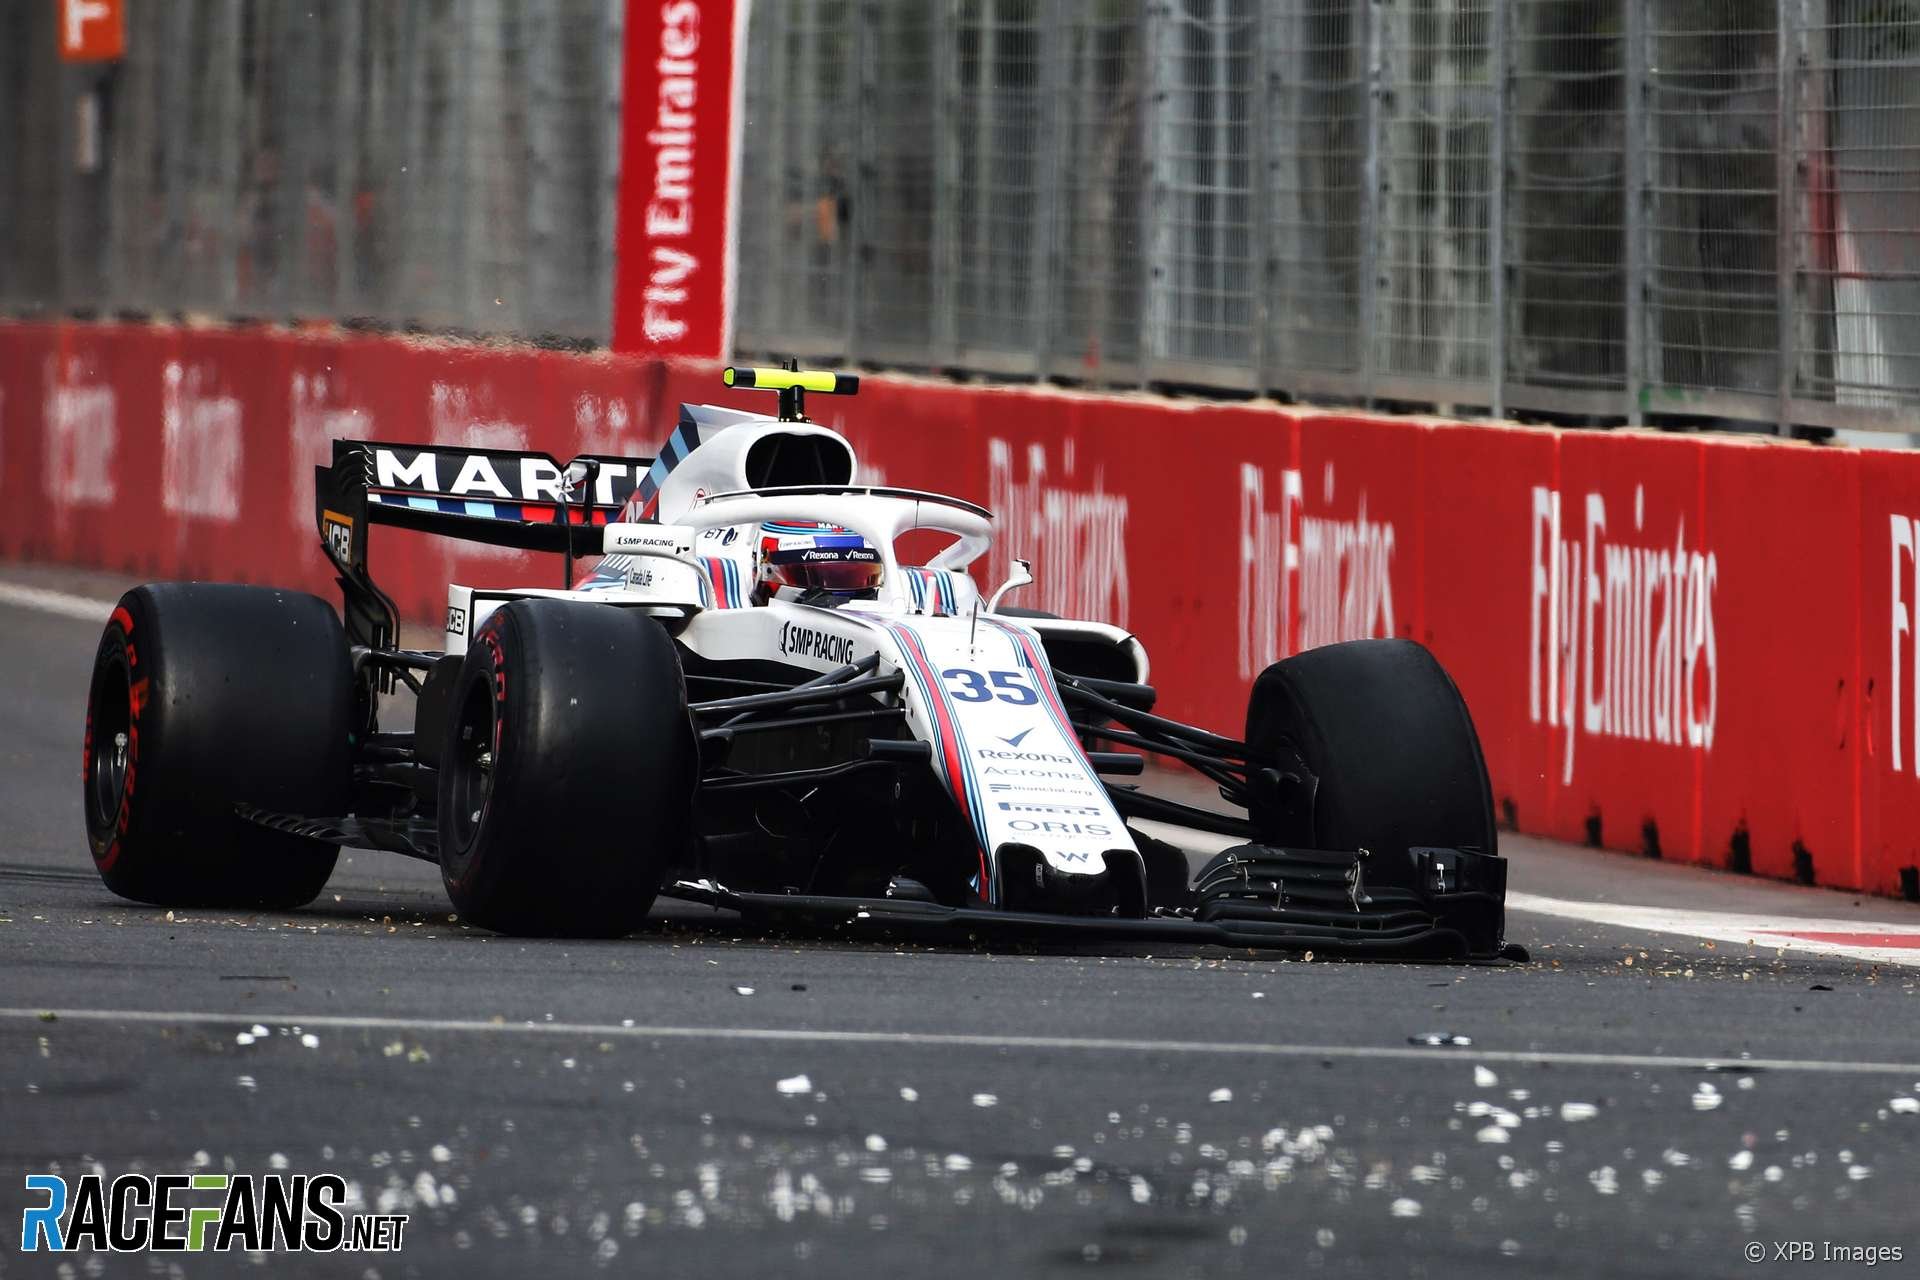 Sergey Sirotkin, Williams, Baku City Circuit, 2018